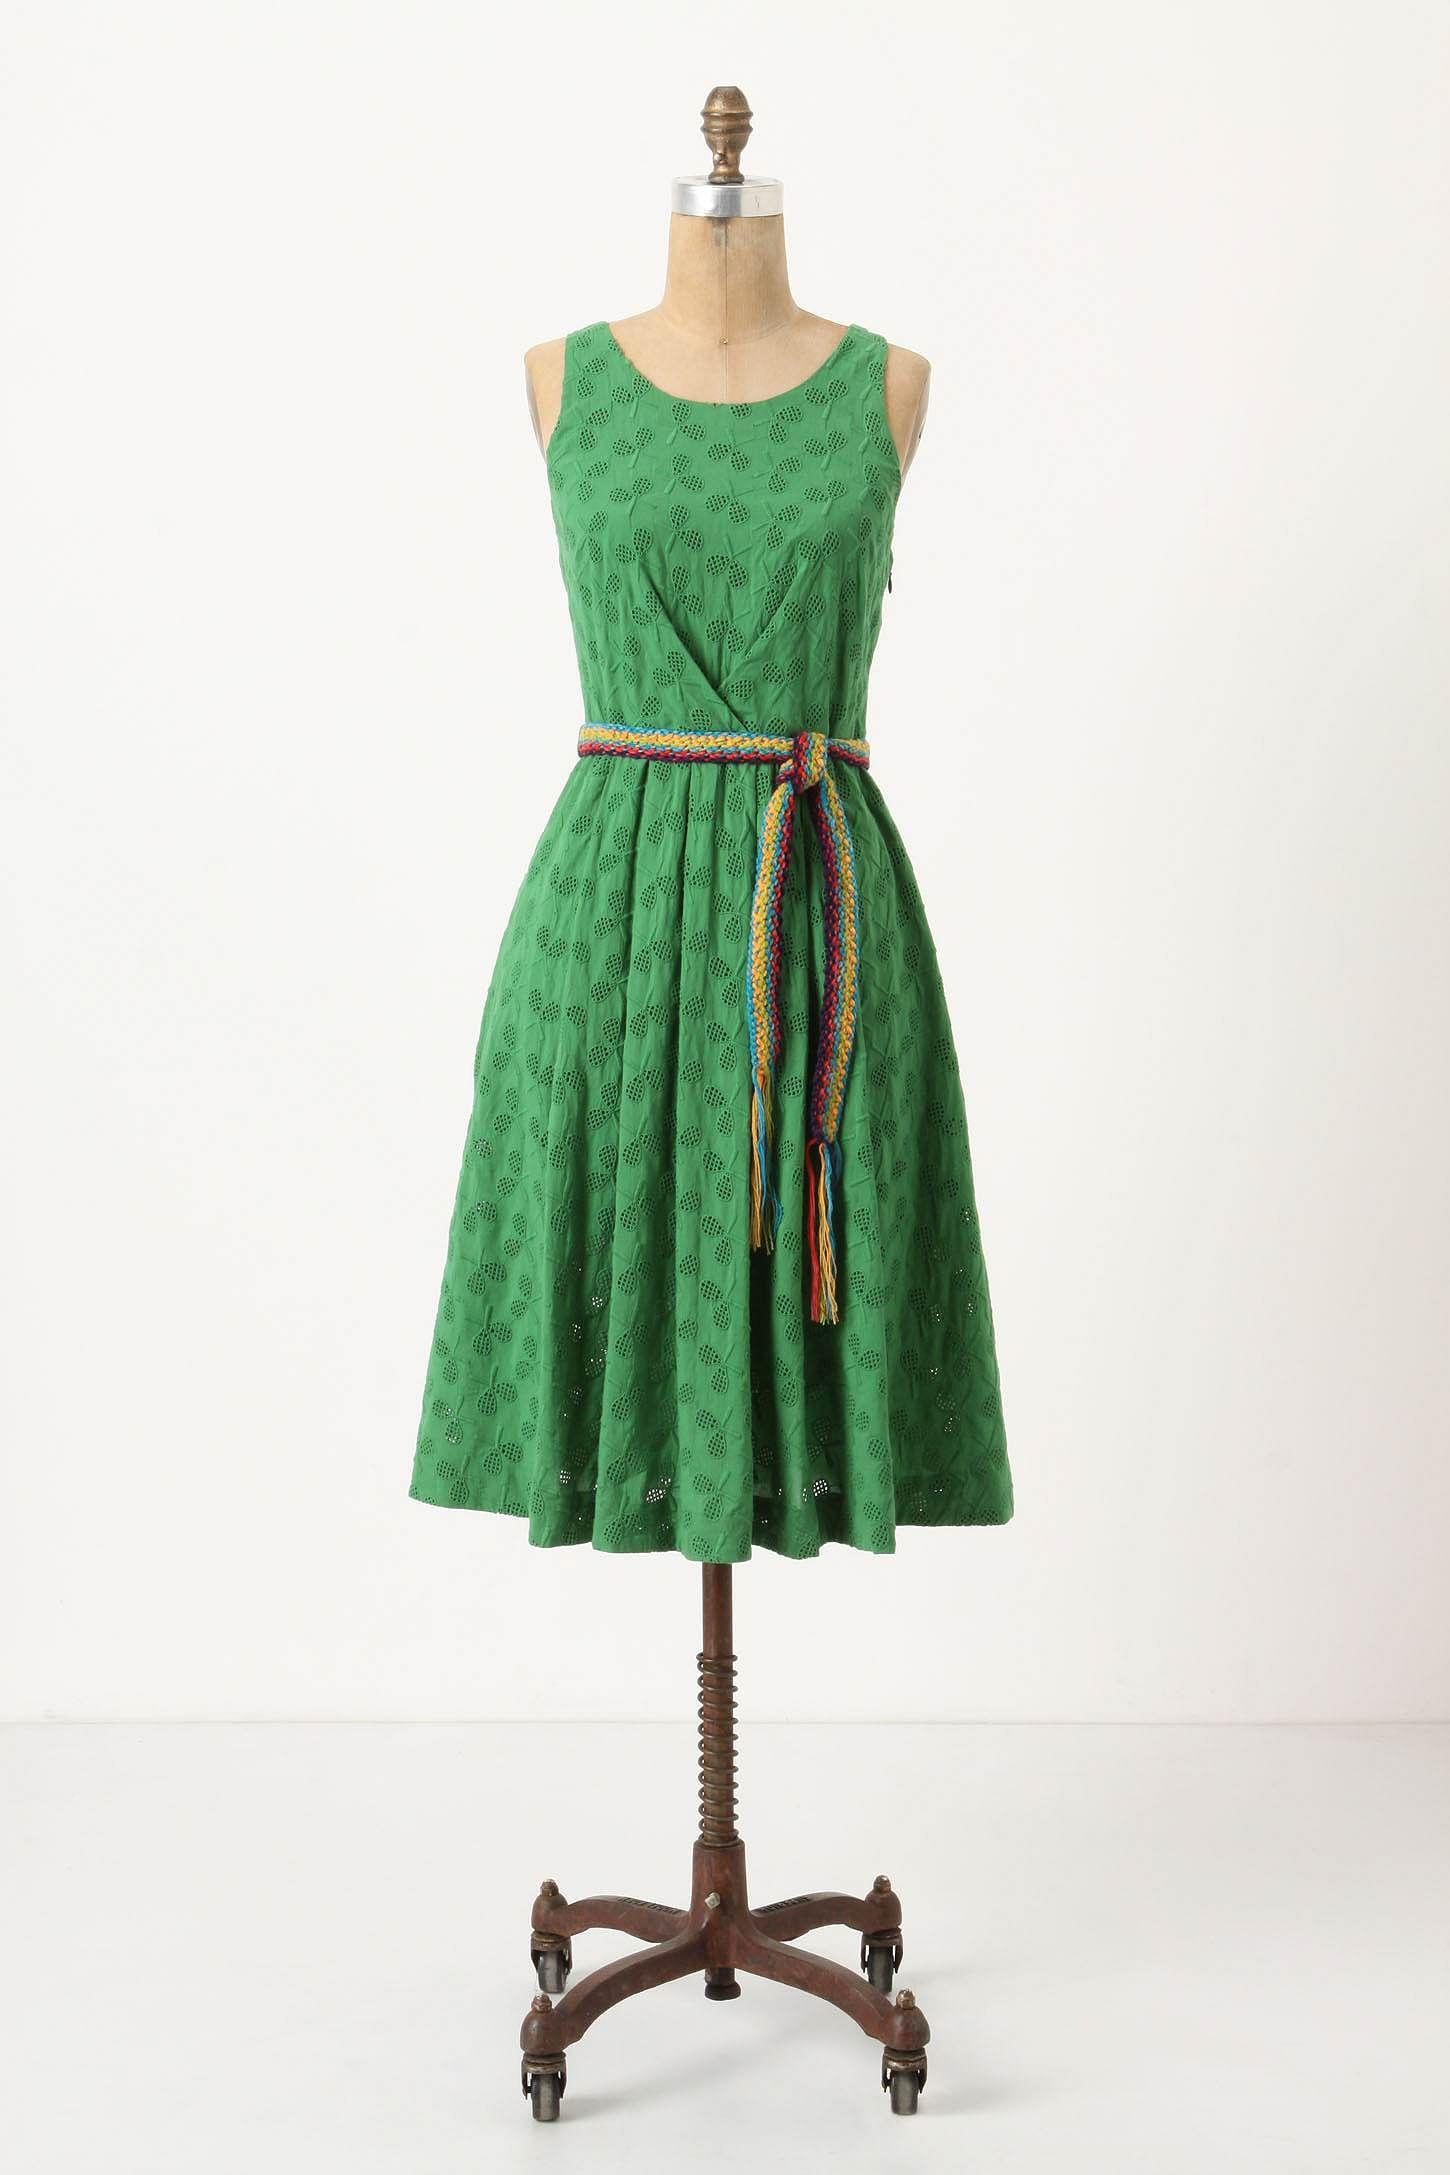 But not a real green dress, that's cruel.